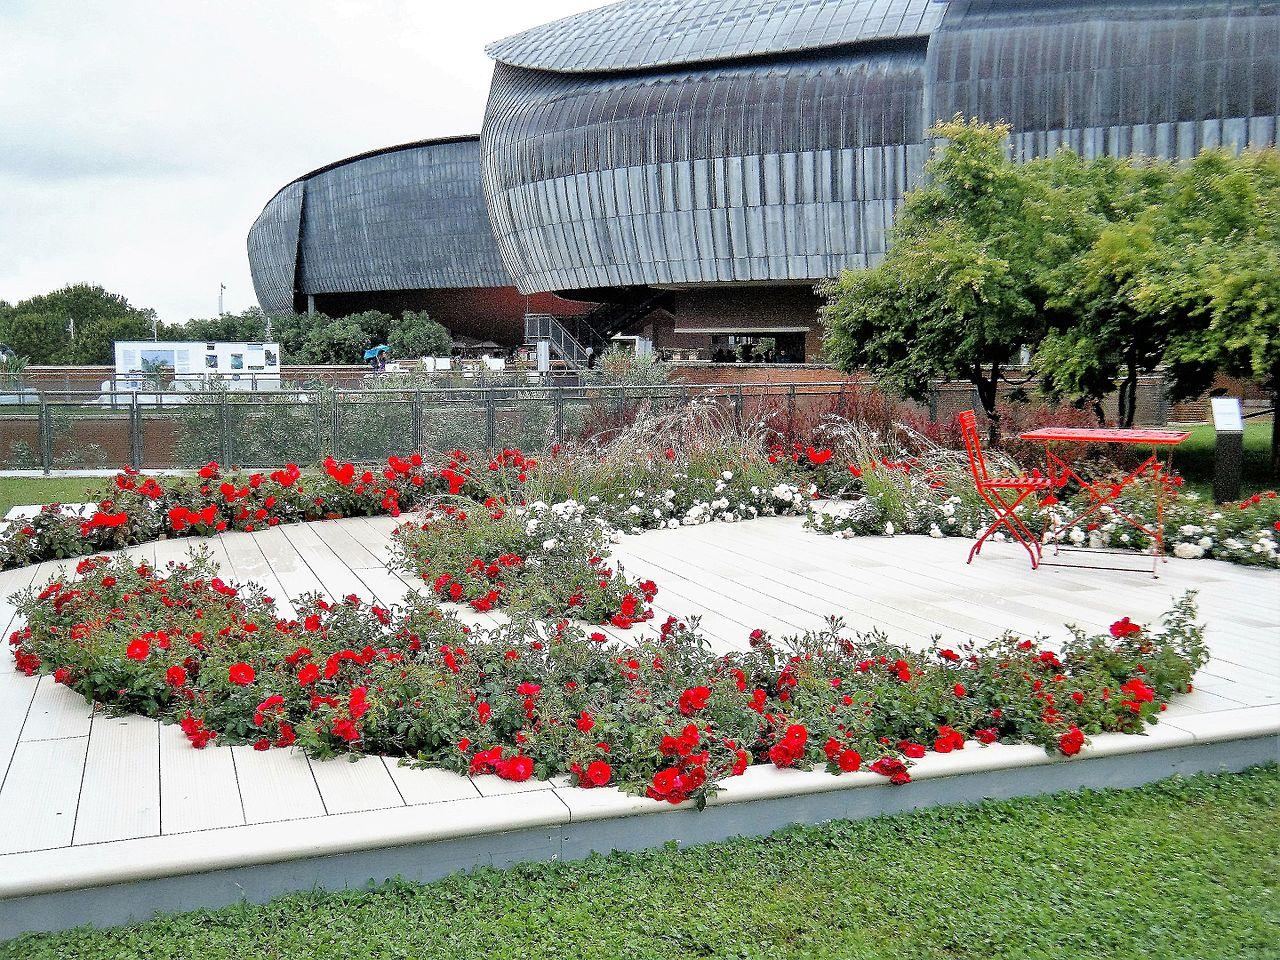 1280px-Auditorium_Parco_della_Musica%2C_Roma%2C_terrazza_in_rosso.jpg